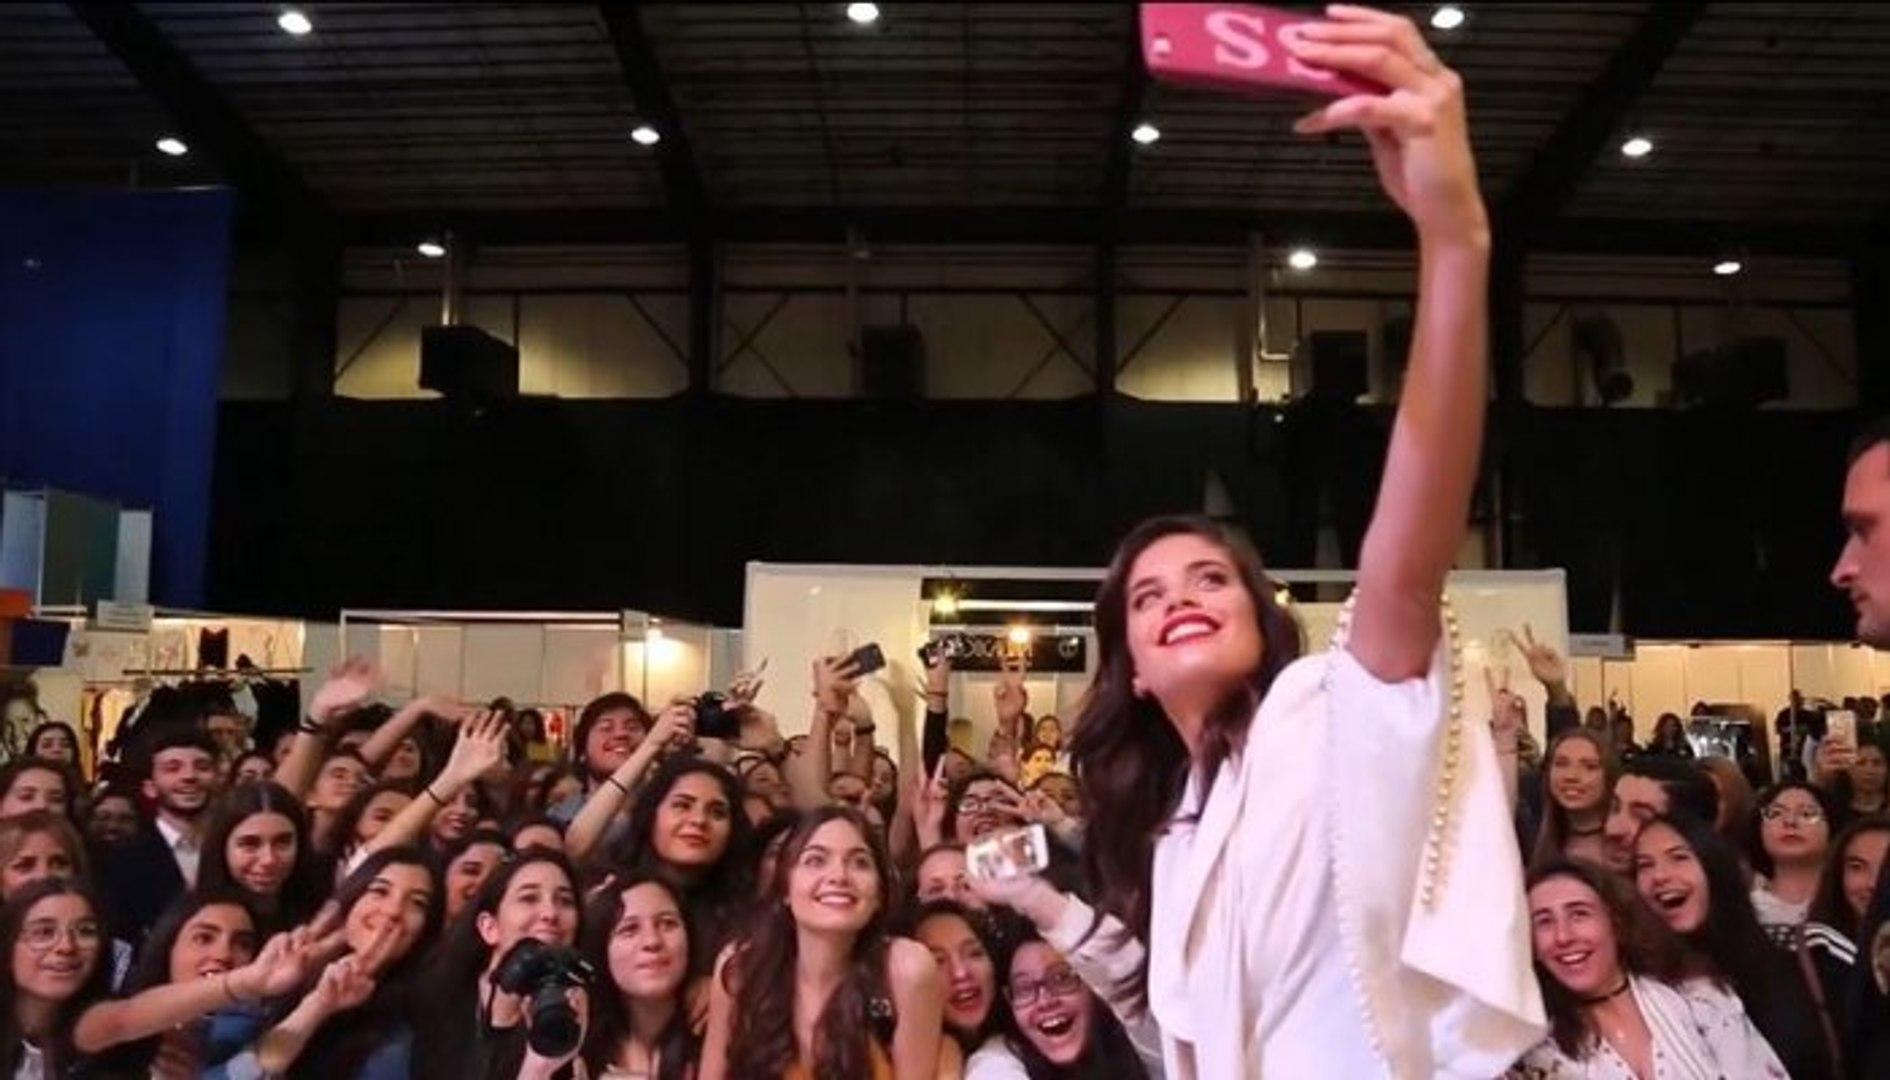 JamaloukiCon: The Fashion & Beauty Festival